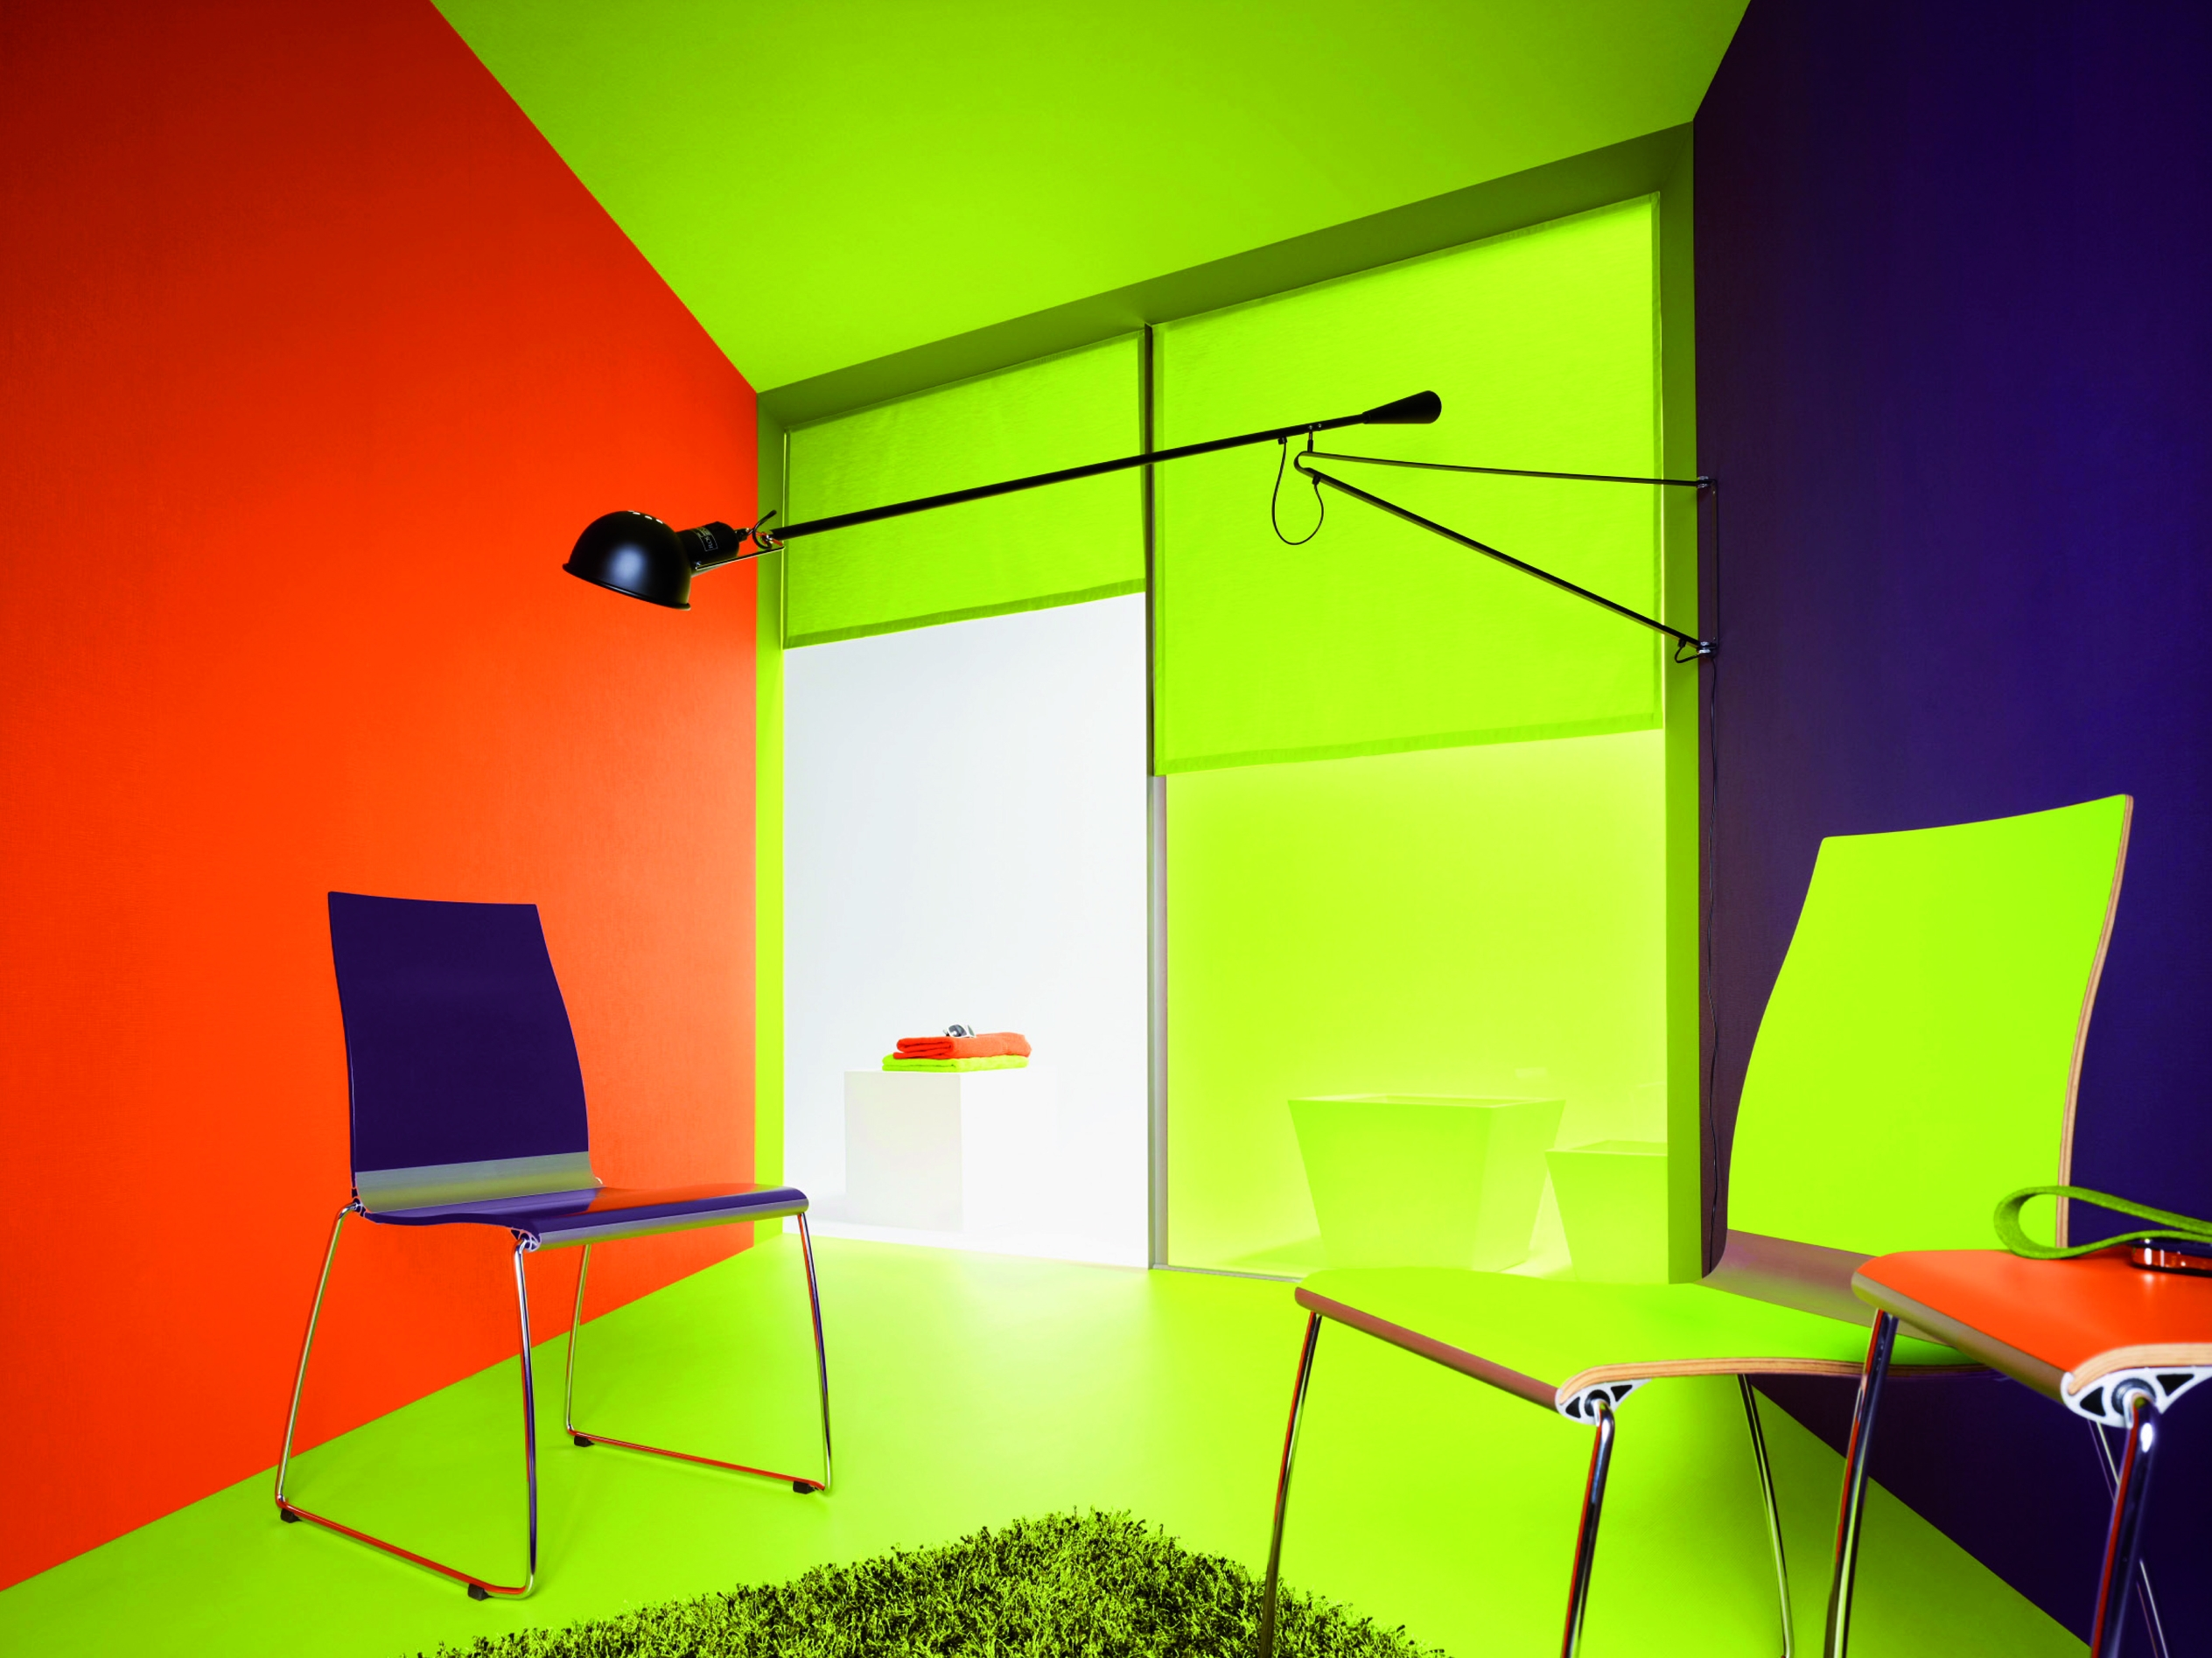 Tapeten trends 2011 mutige kombinationen in farben for Raumgestaltung 2 farben